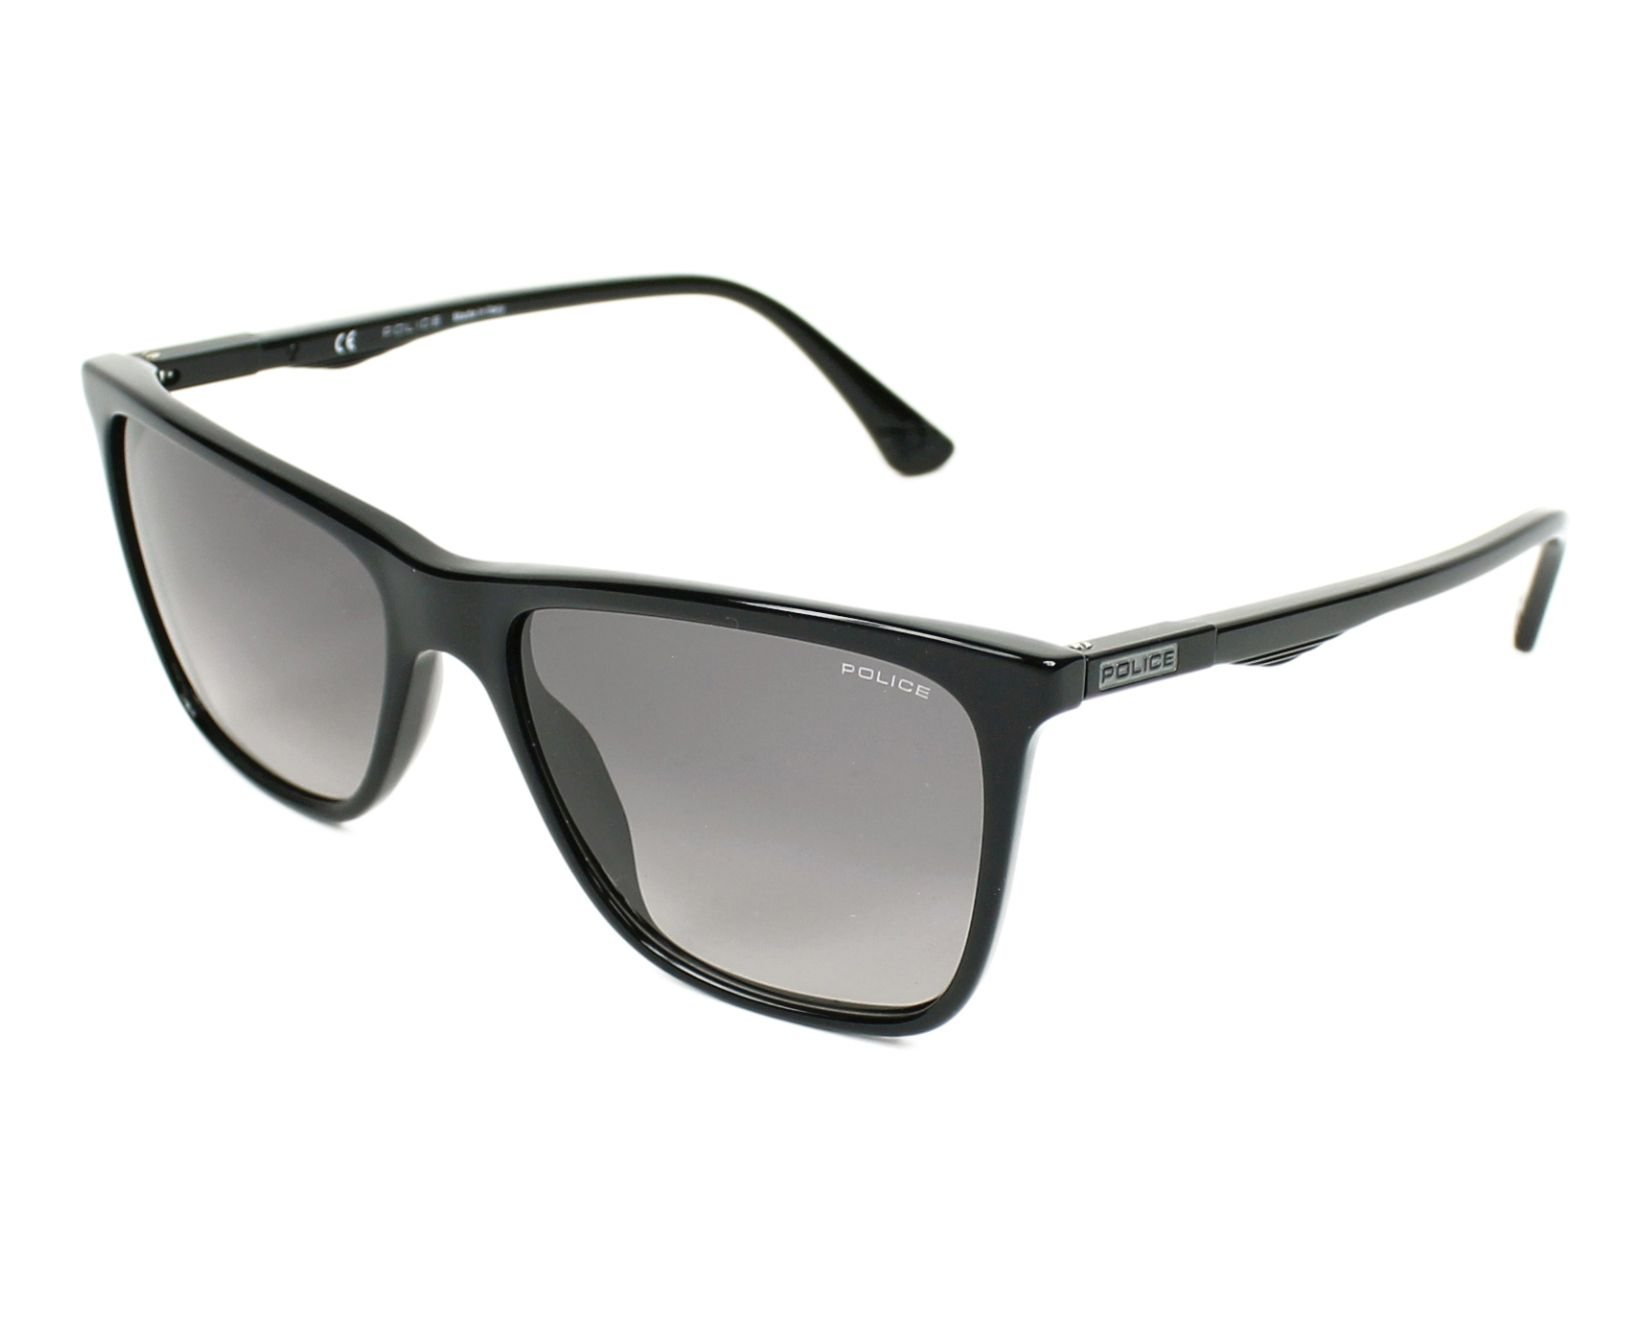 lunettes de soleil police spl 362 0700 noir pas cher visionet. Black Bedroom Furniture Sets. Home Design Ideas